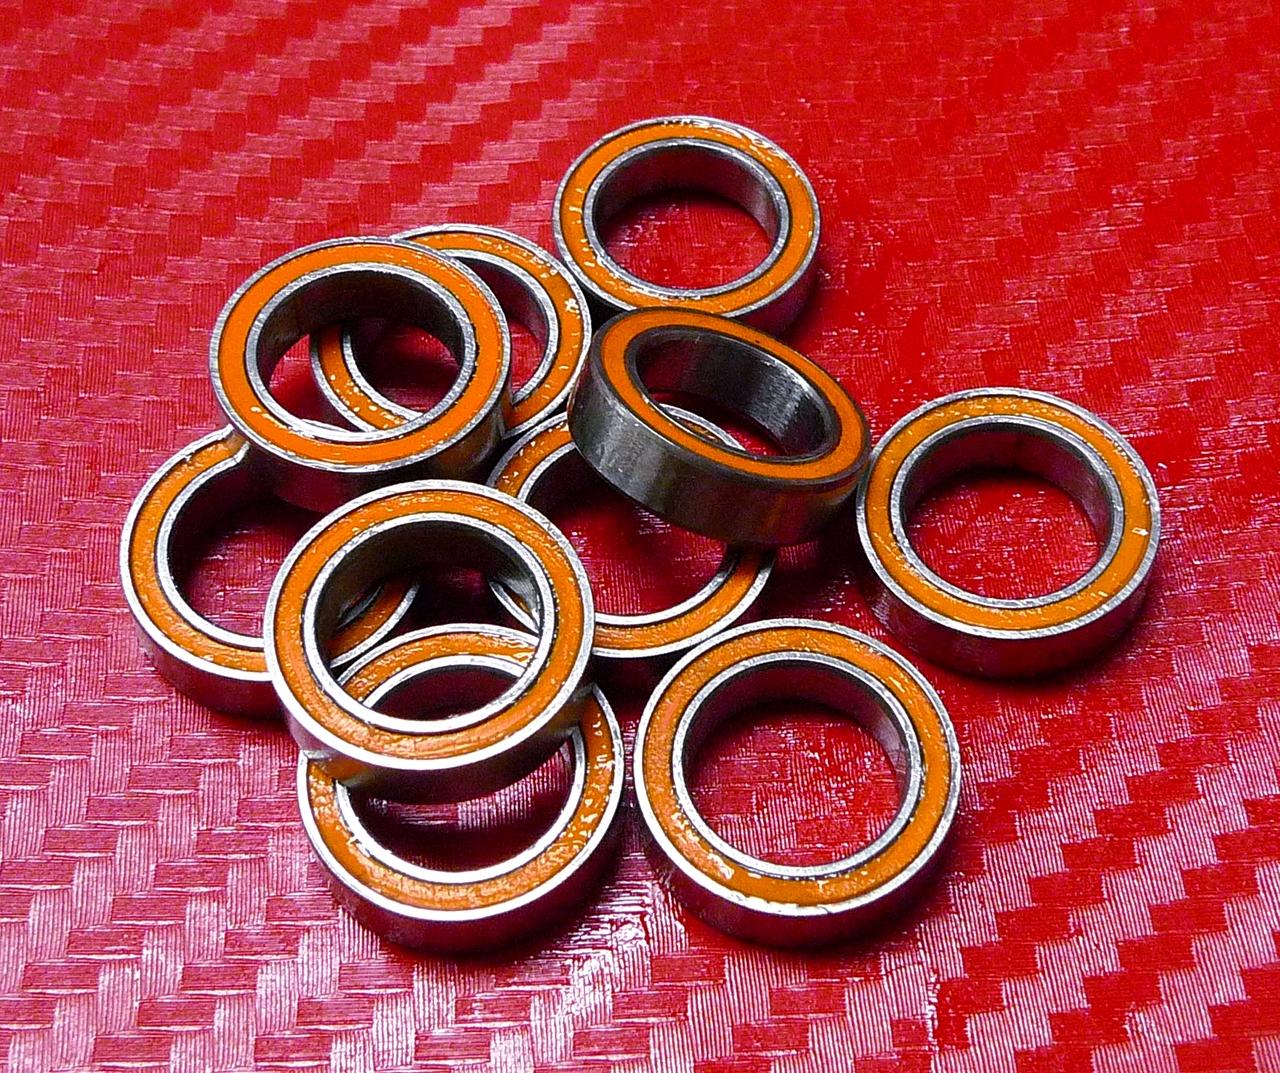 S6700-2RS CERAMIC 440c S.Steel Ball Bearing 6700RS ABEC-7 10x15x4 mm QTY 4